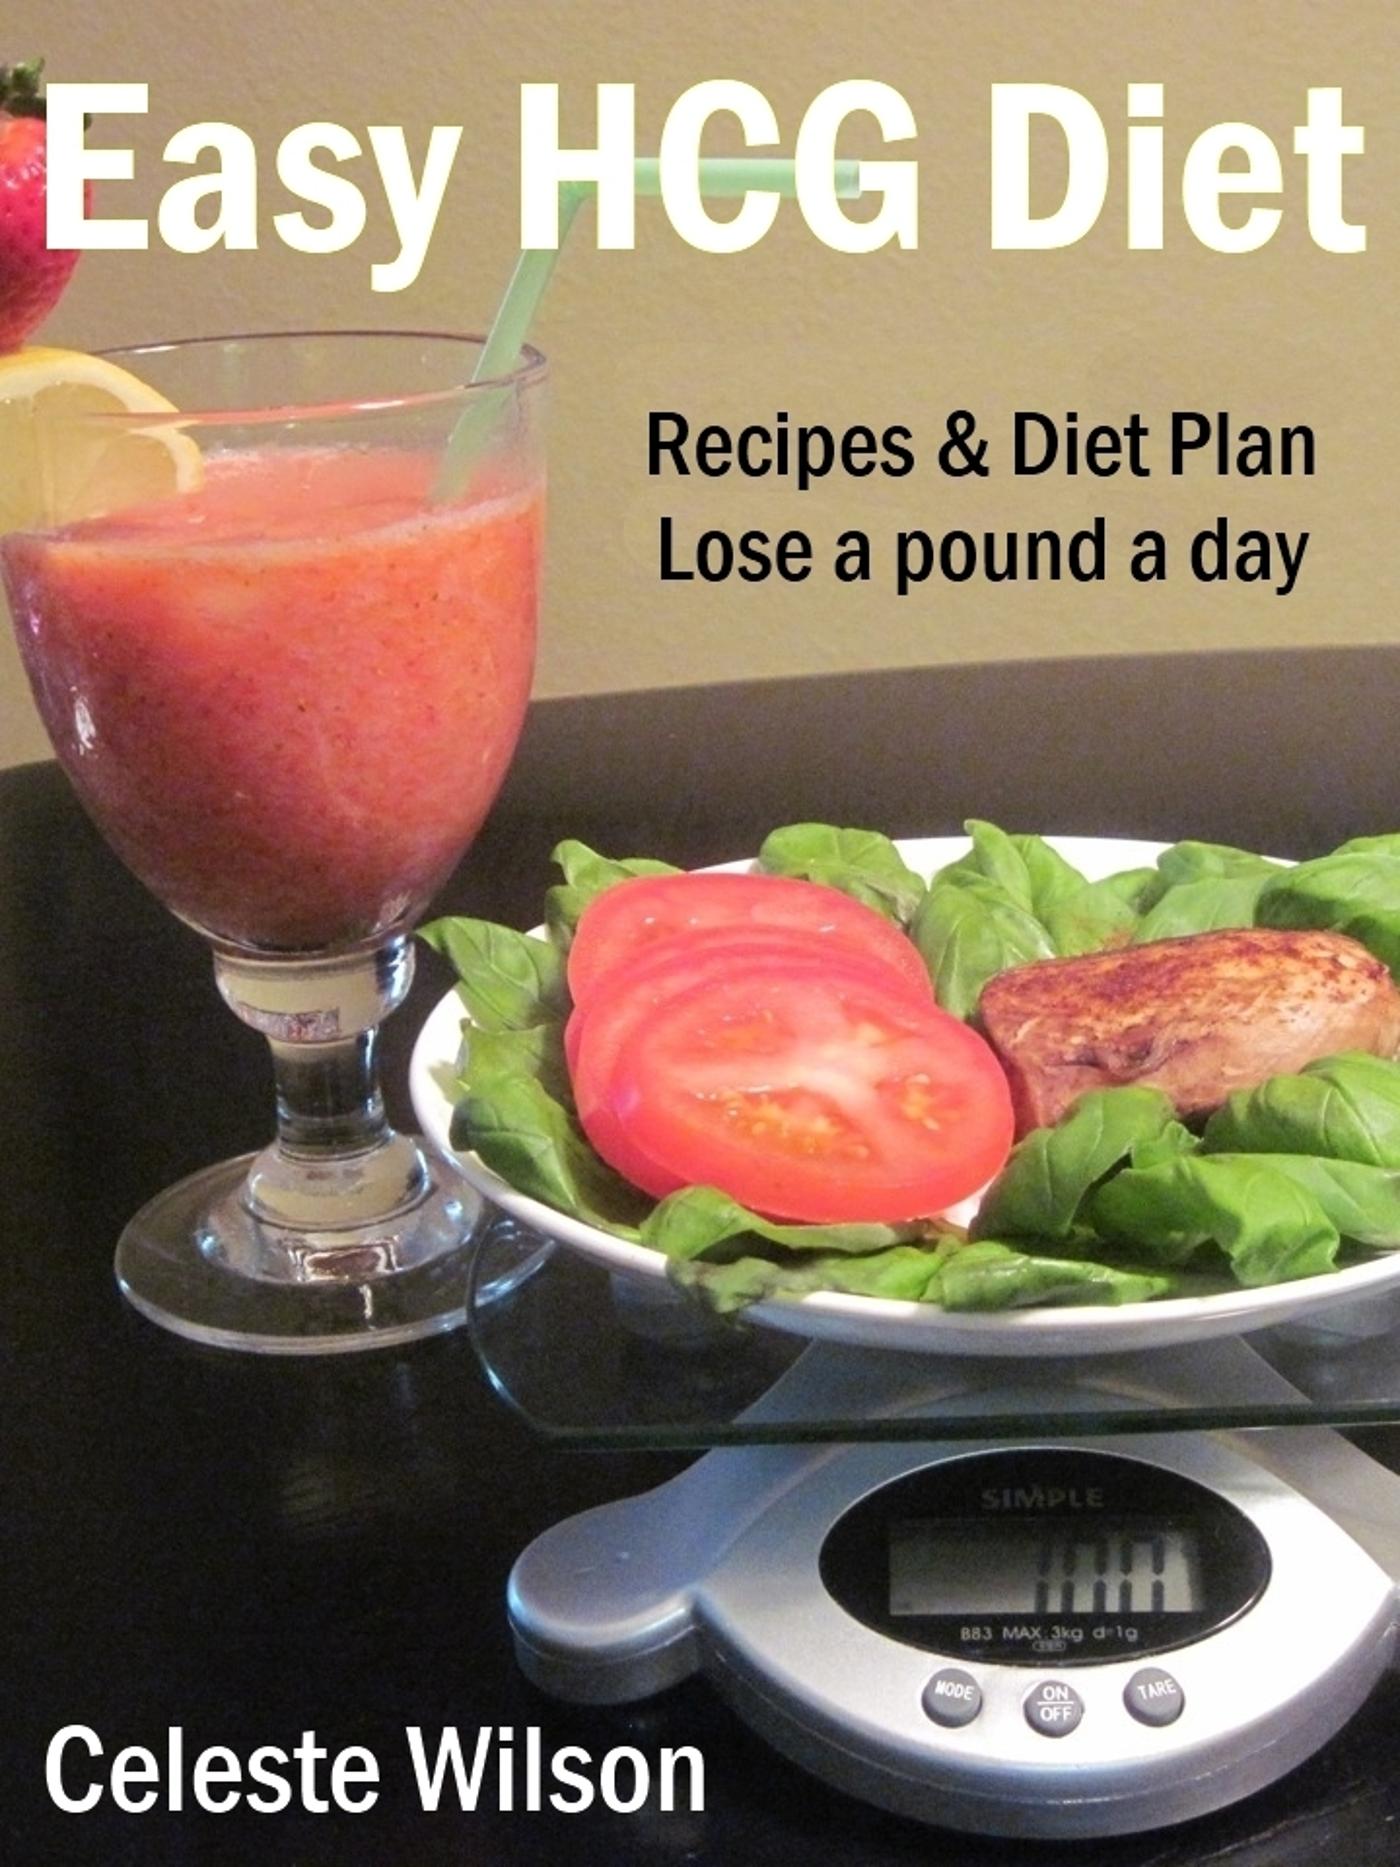 Hcg diet plan drinks